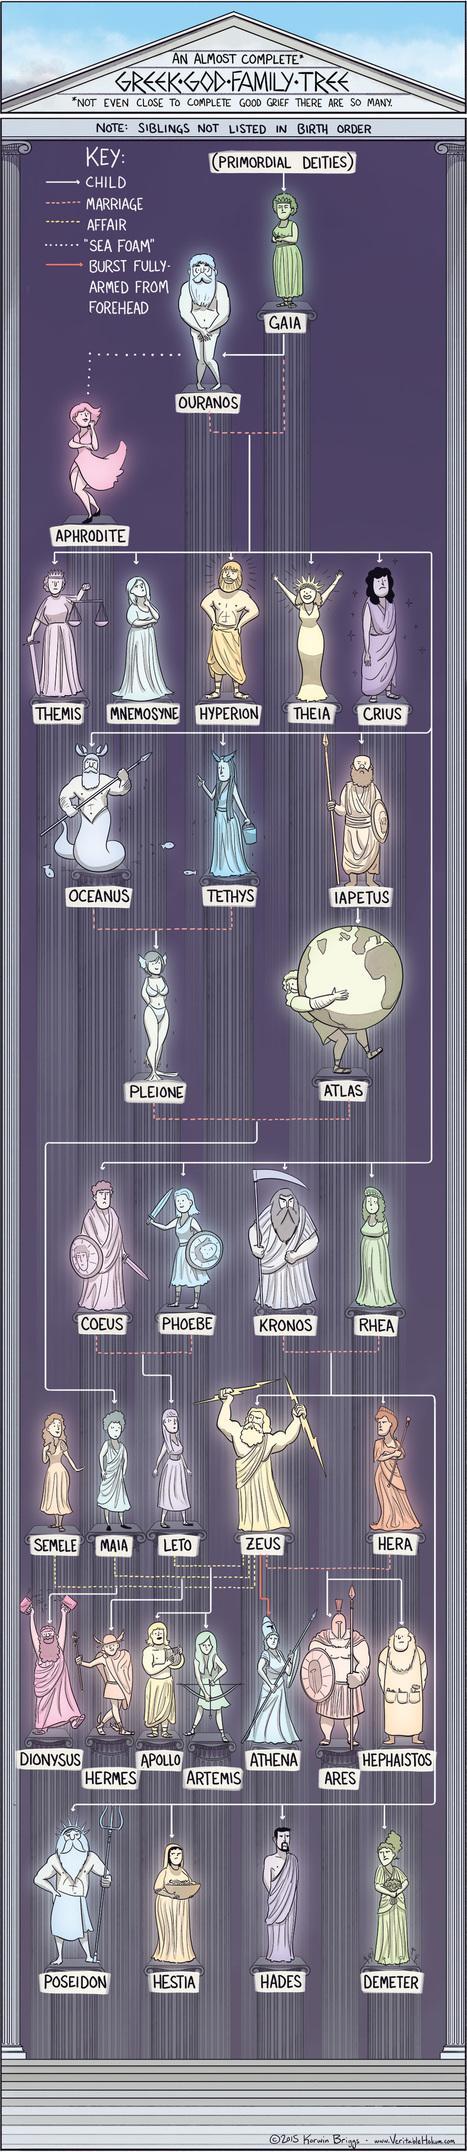 The Greek God Family Tree – Veritable Hokum | Merveilles - Marvels | Scoop.it